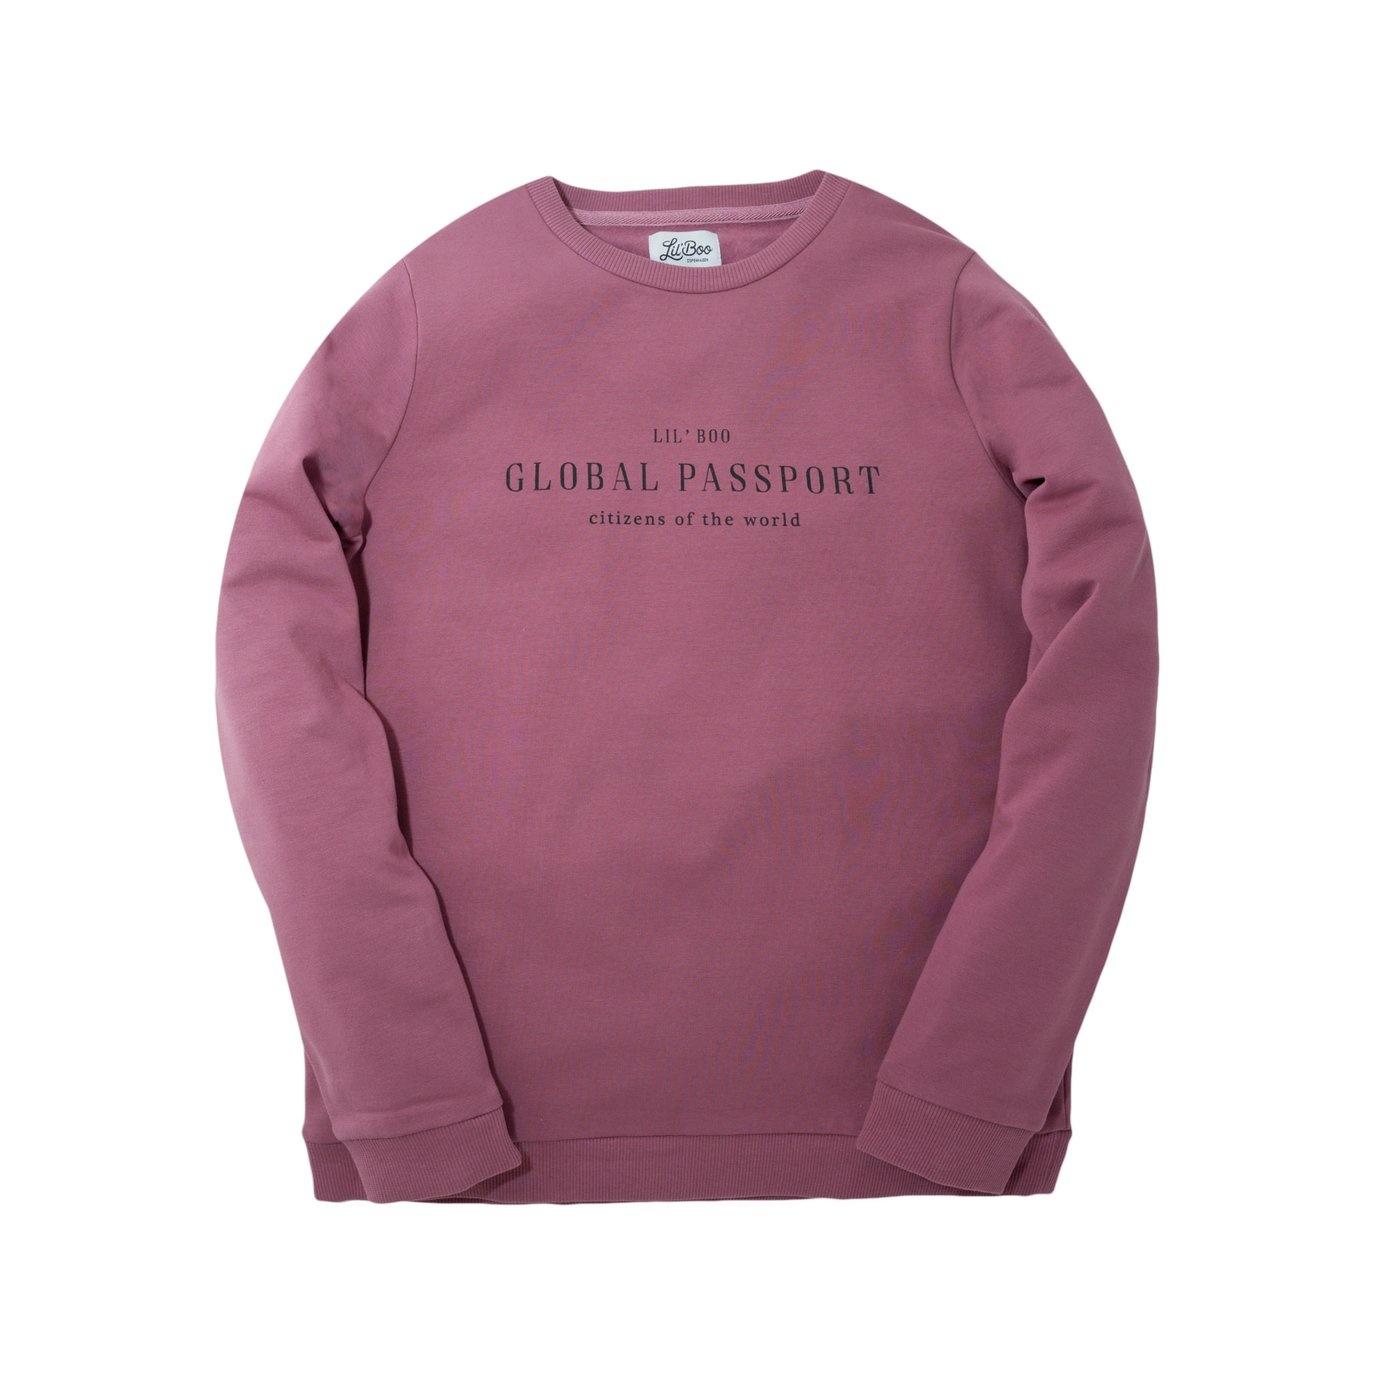 Global Passport - Citizen of the World Sweatshirt-1